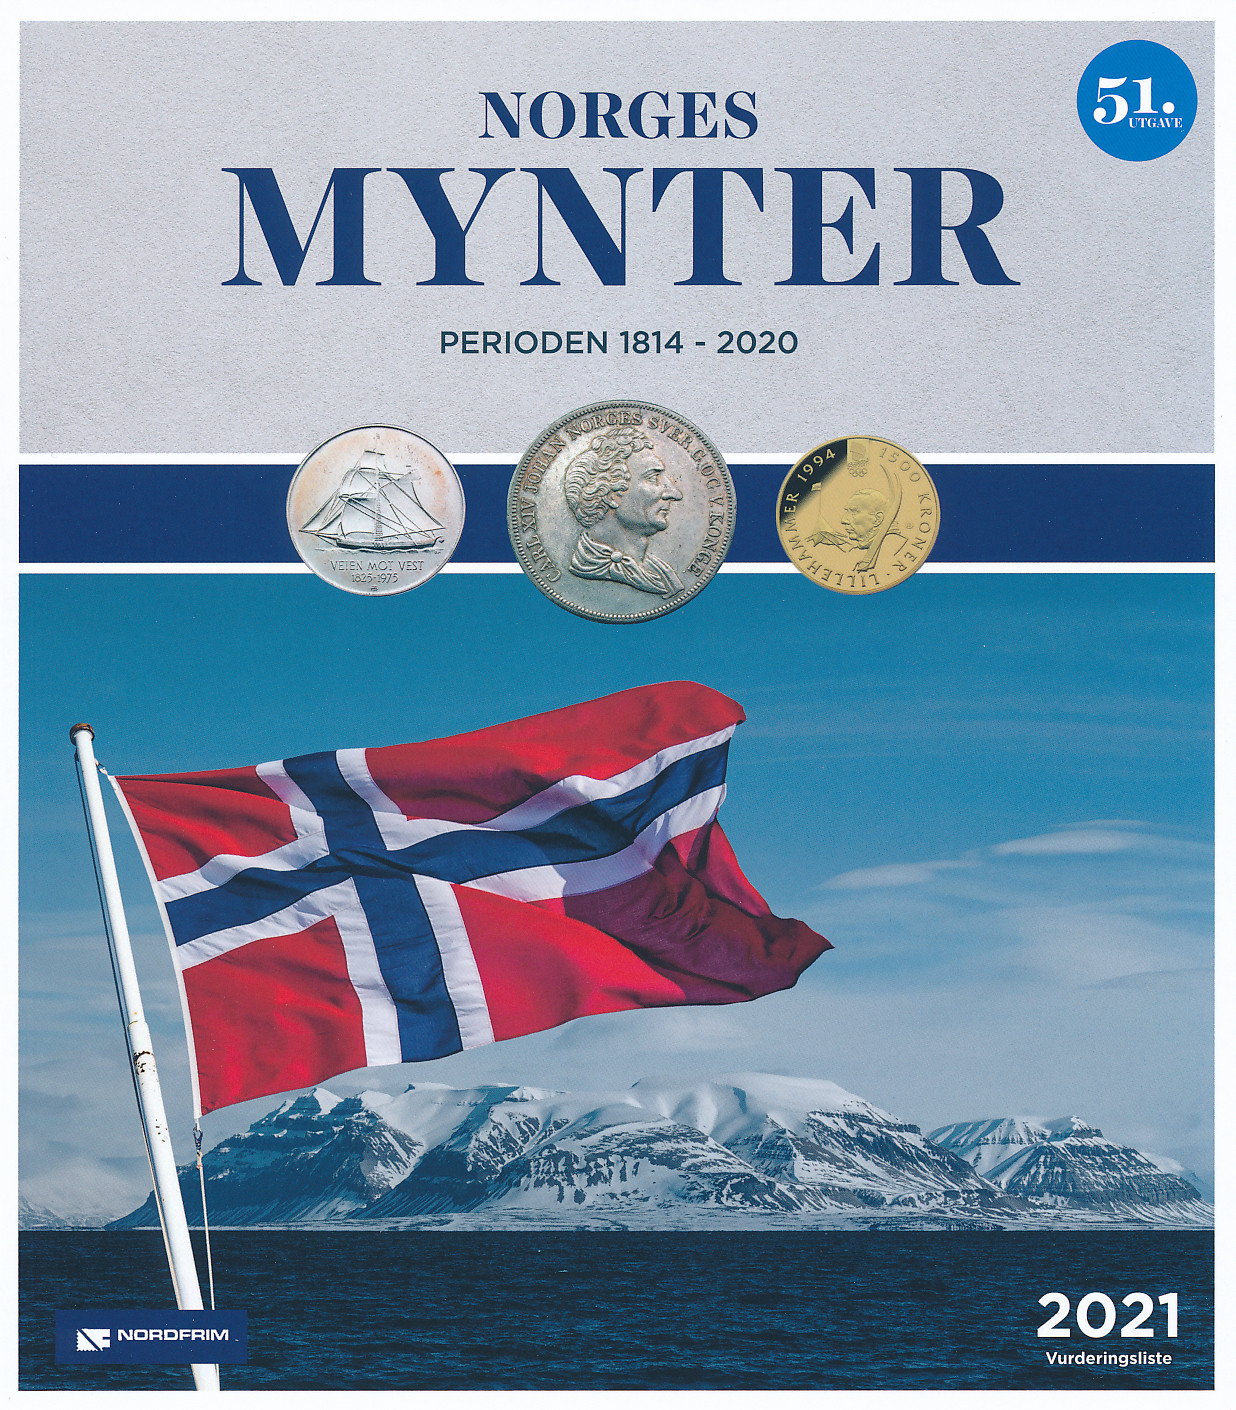 Norges Mynter 1814 til 2021 utgave 51 denne katalogen er den nyeste utgaven